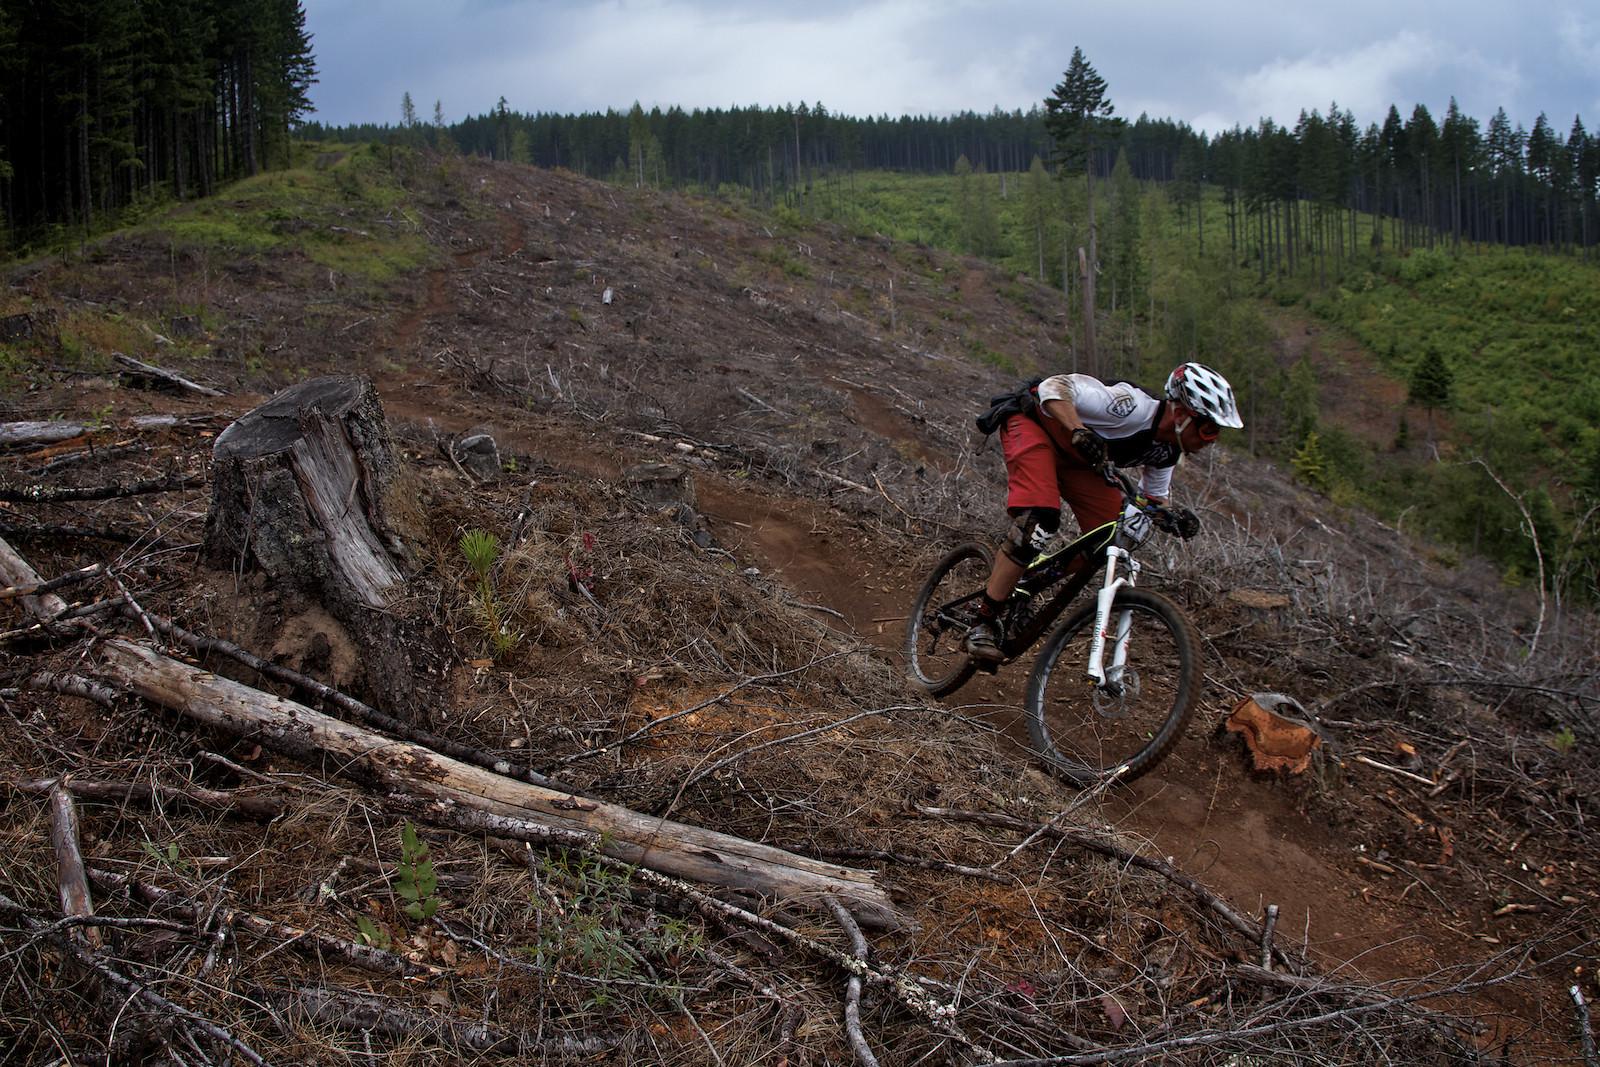 Oregon Enduro Series Hood River, Stage 2 with Craig Harvey - corytepper.com - Mountain Biking Pictures - Vital MTB